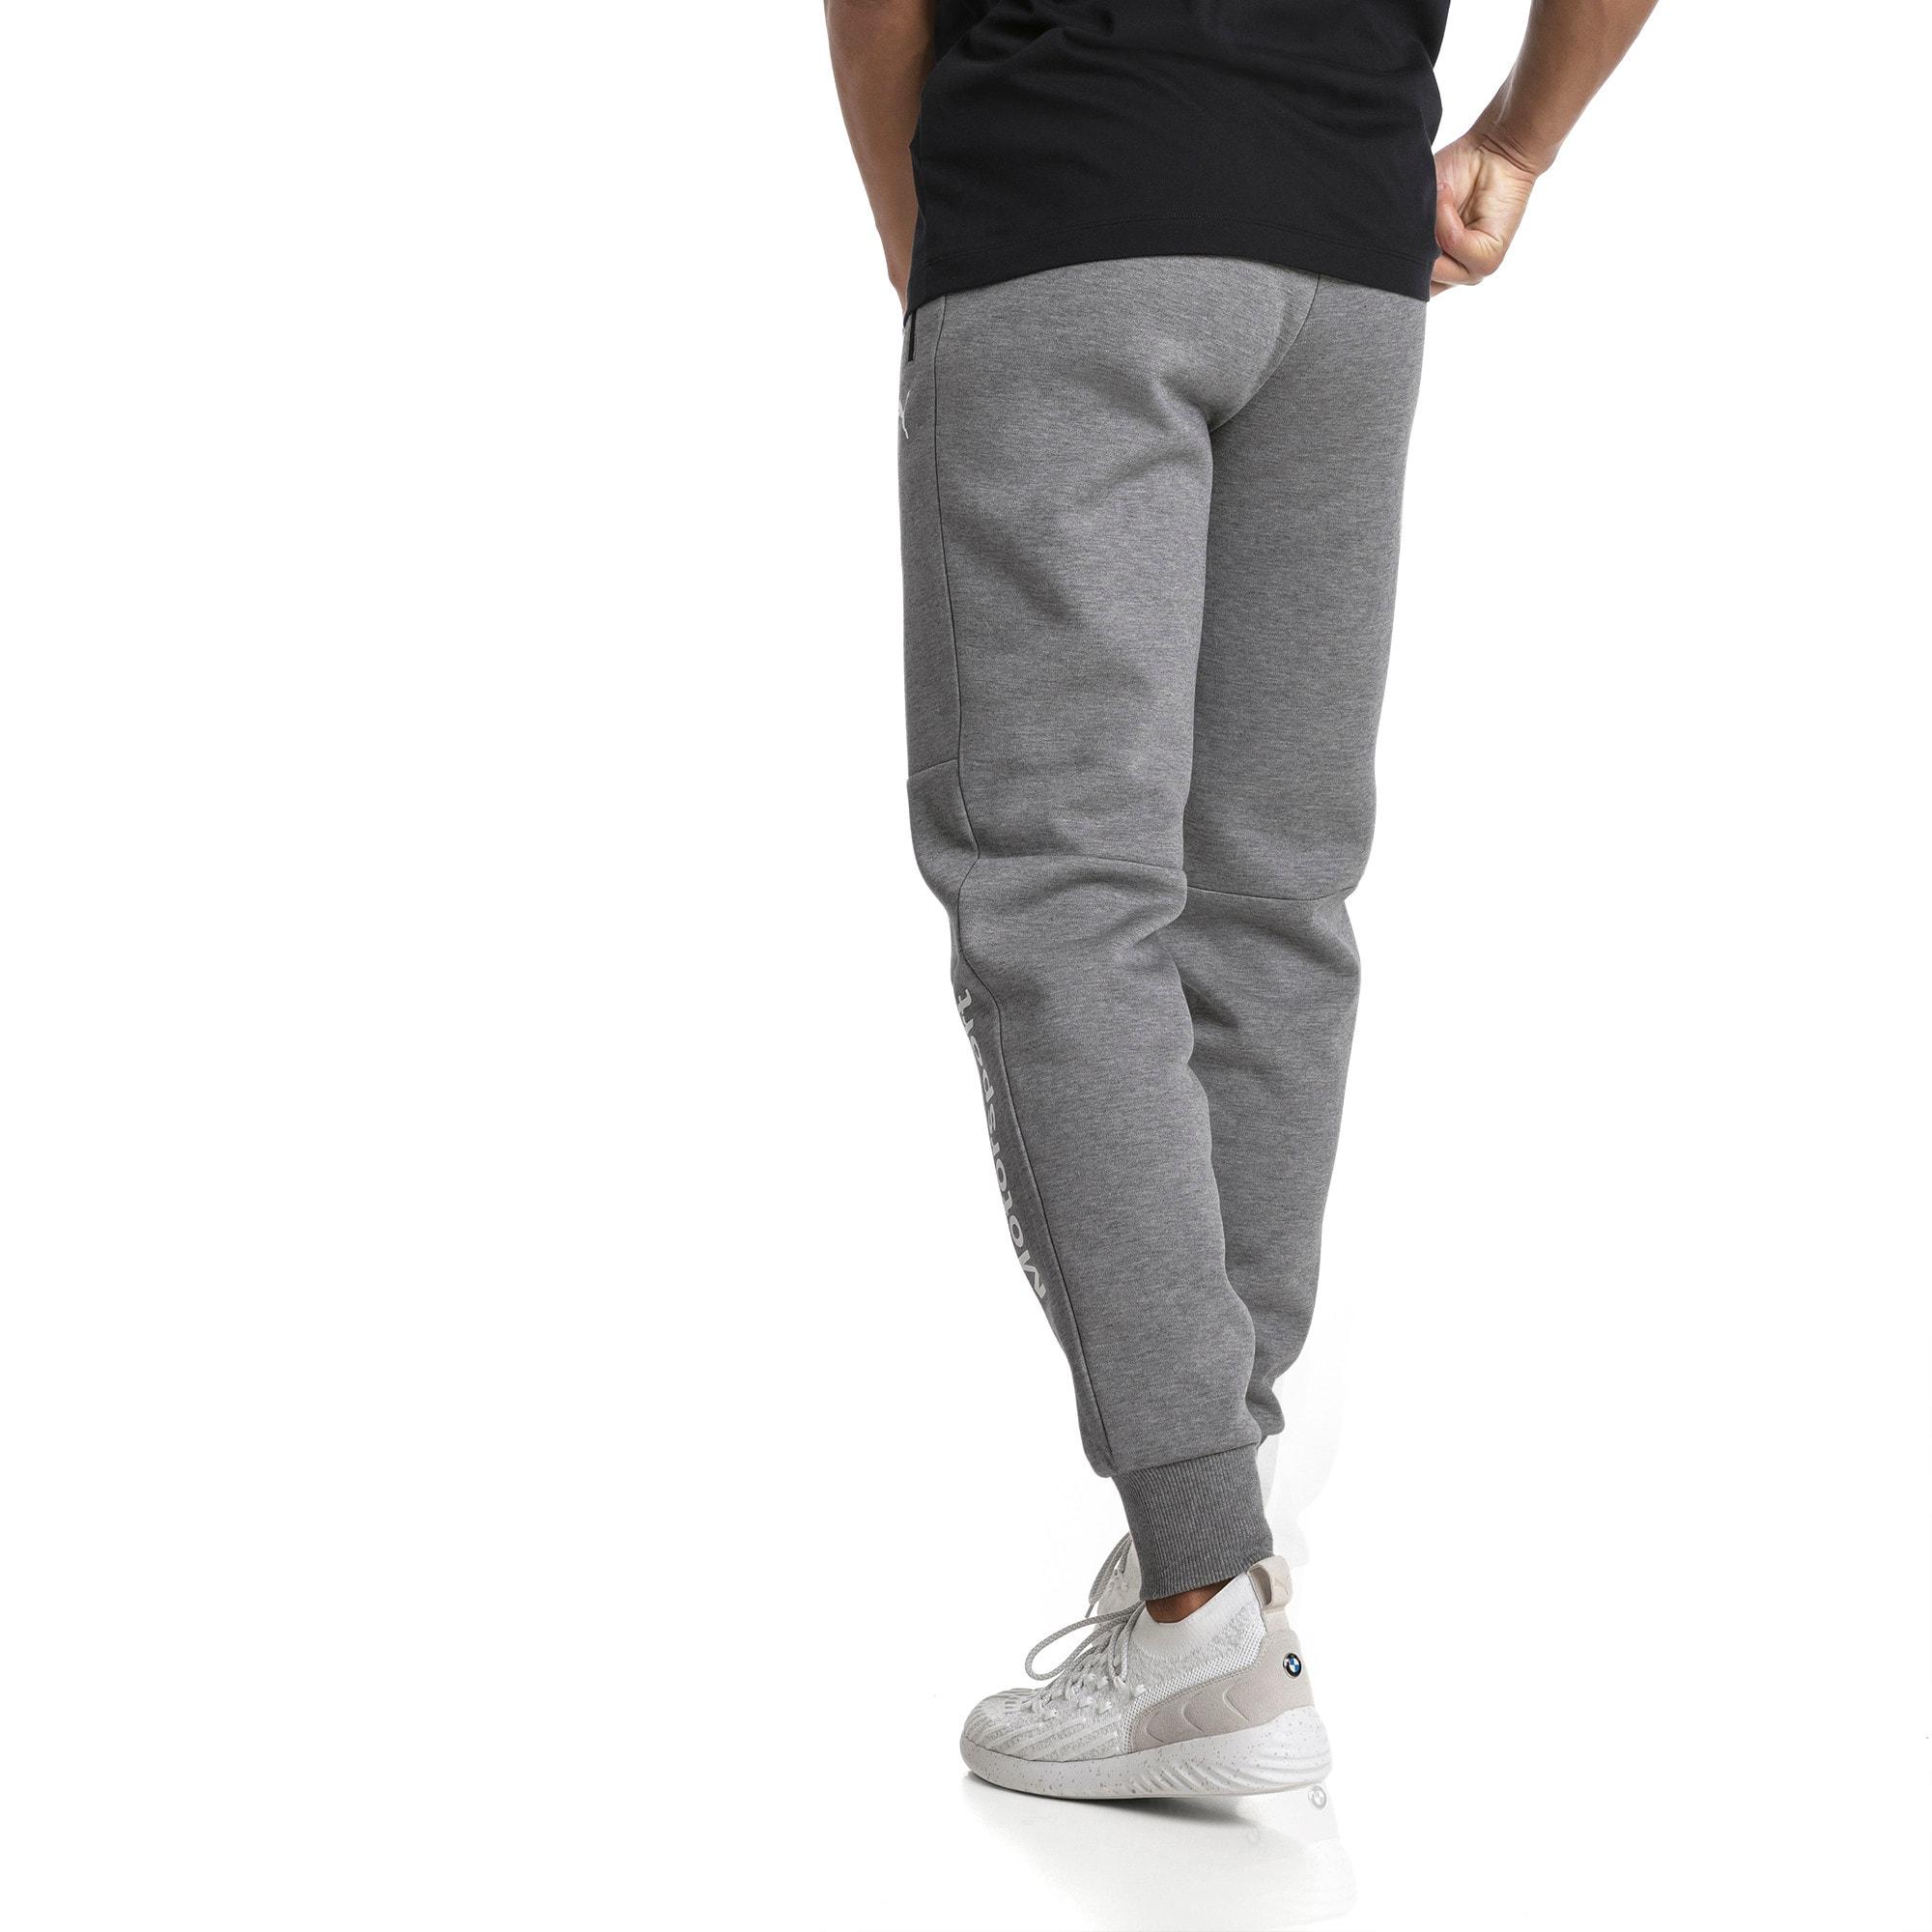 Thumbnail 3 of BMW Men's Sweatpants, Medium Gray Heather, medium